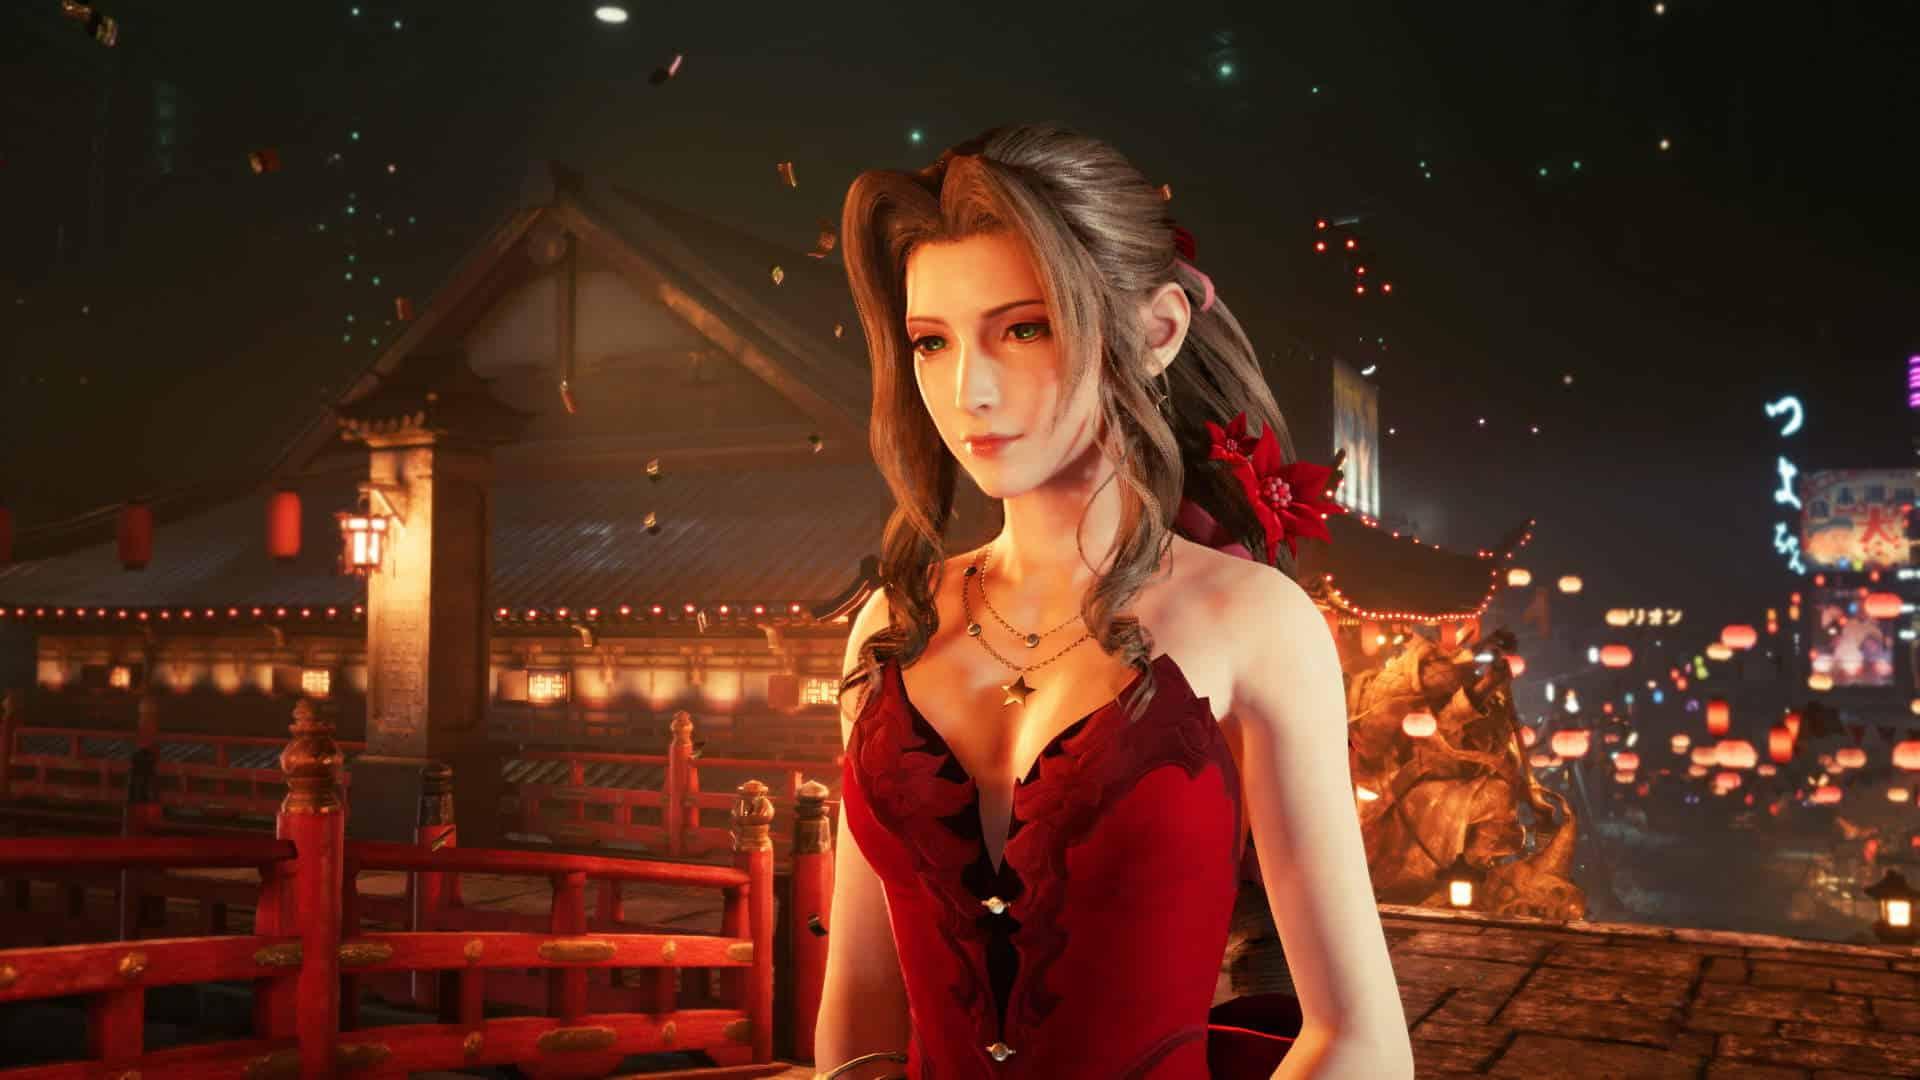 Sony PlayStation 1 renaissance resurgence PS1 classics video games Aerith Final Fantasy VII Remake Square Enix